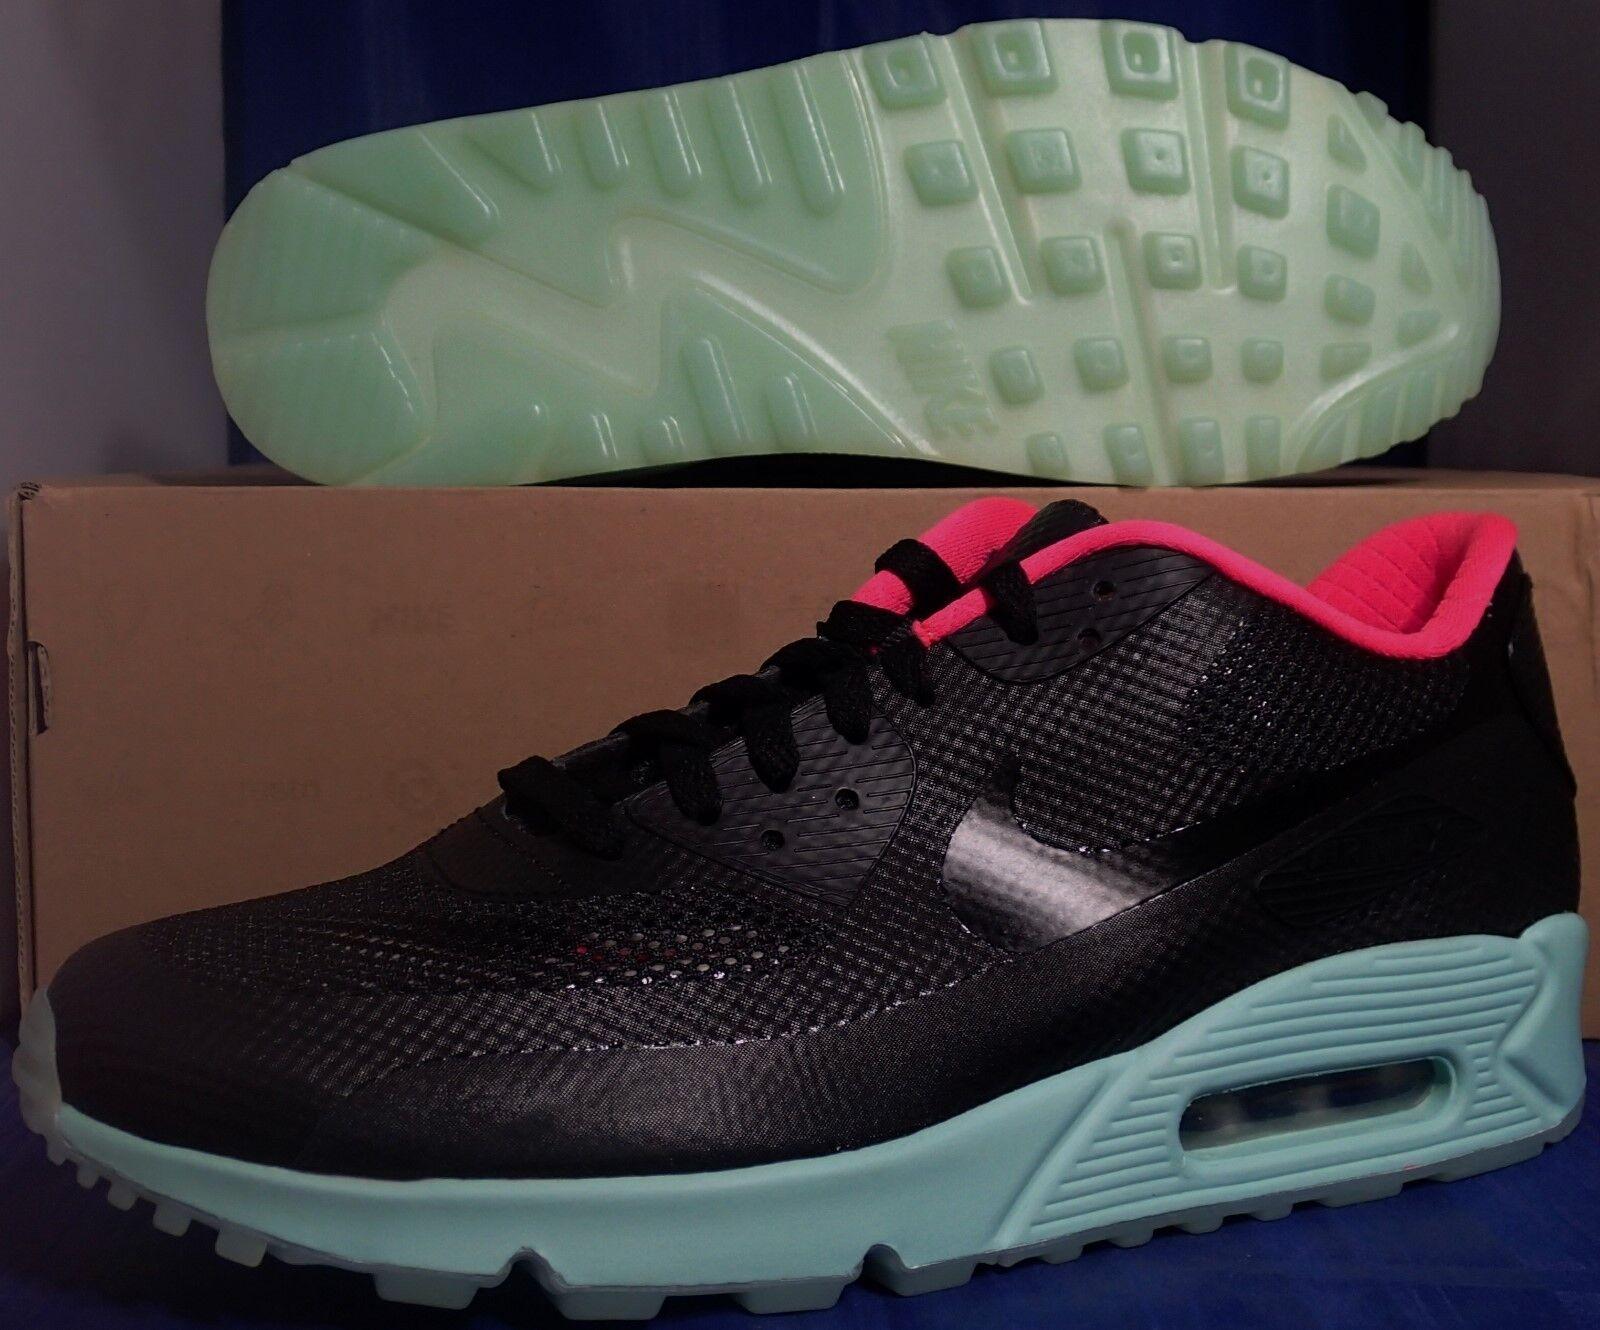 e72386c03621 Nike Nike Nike Air Max 90 Hyperfuse Premium Id Noir Menthe Rose Yeezy Sz 10  (